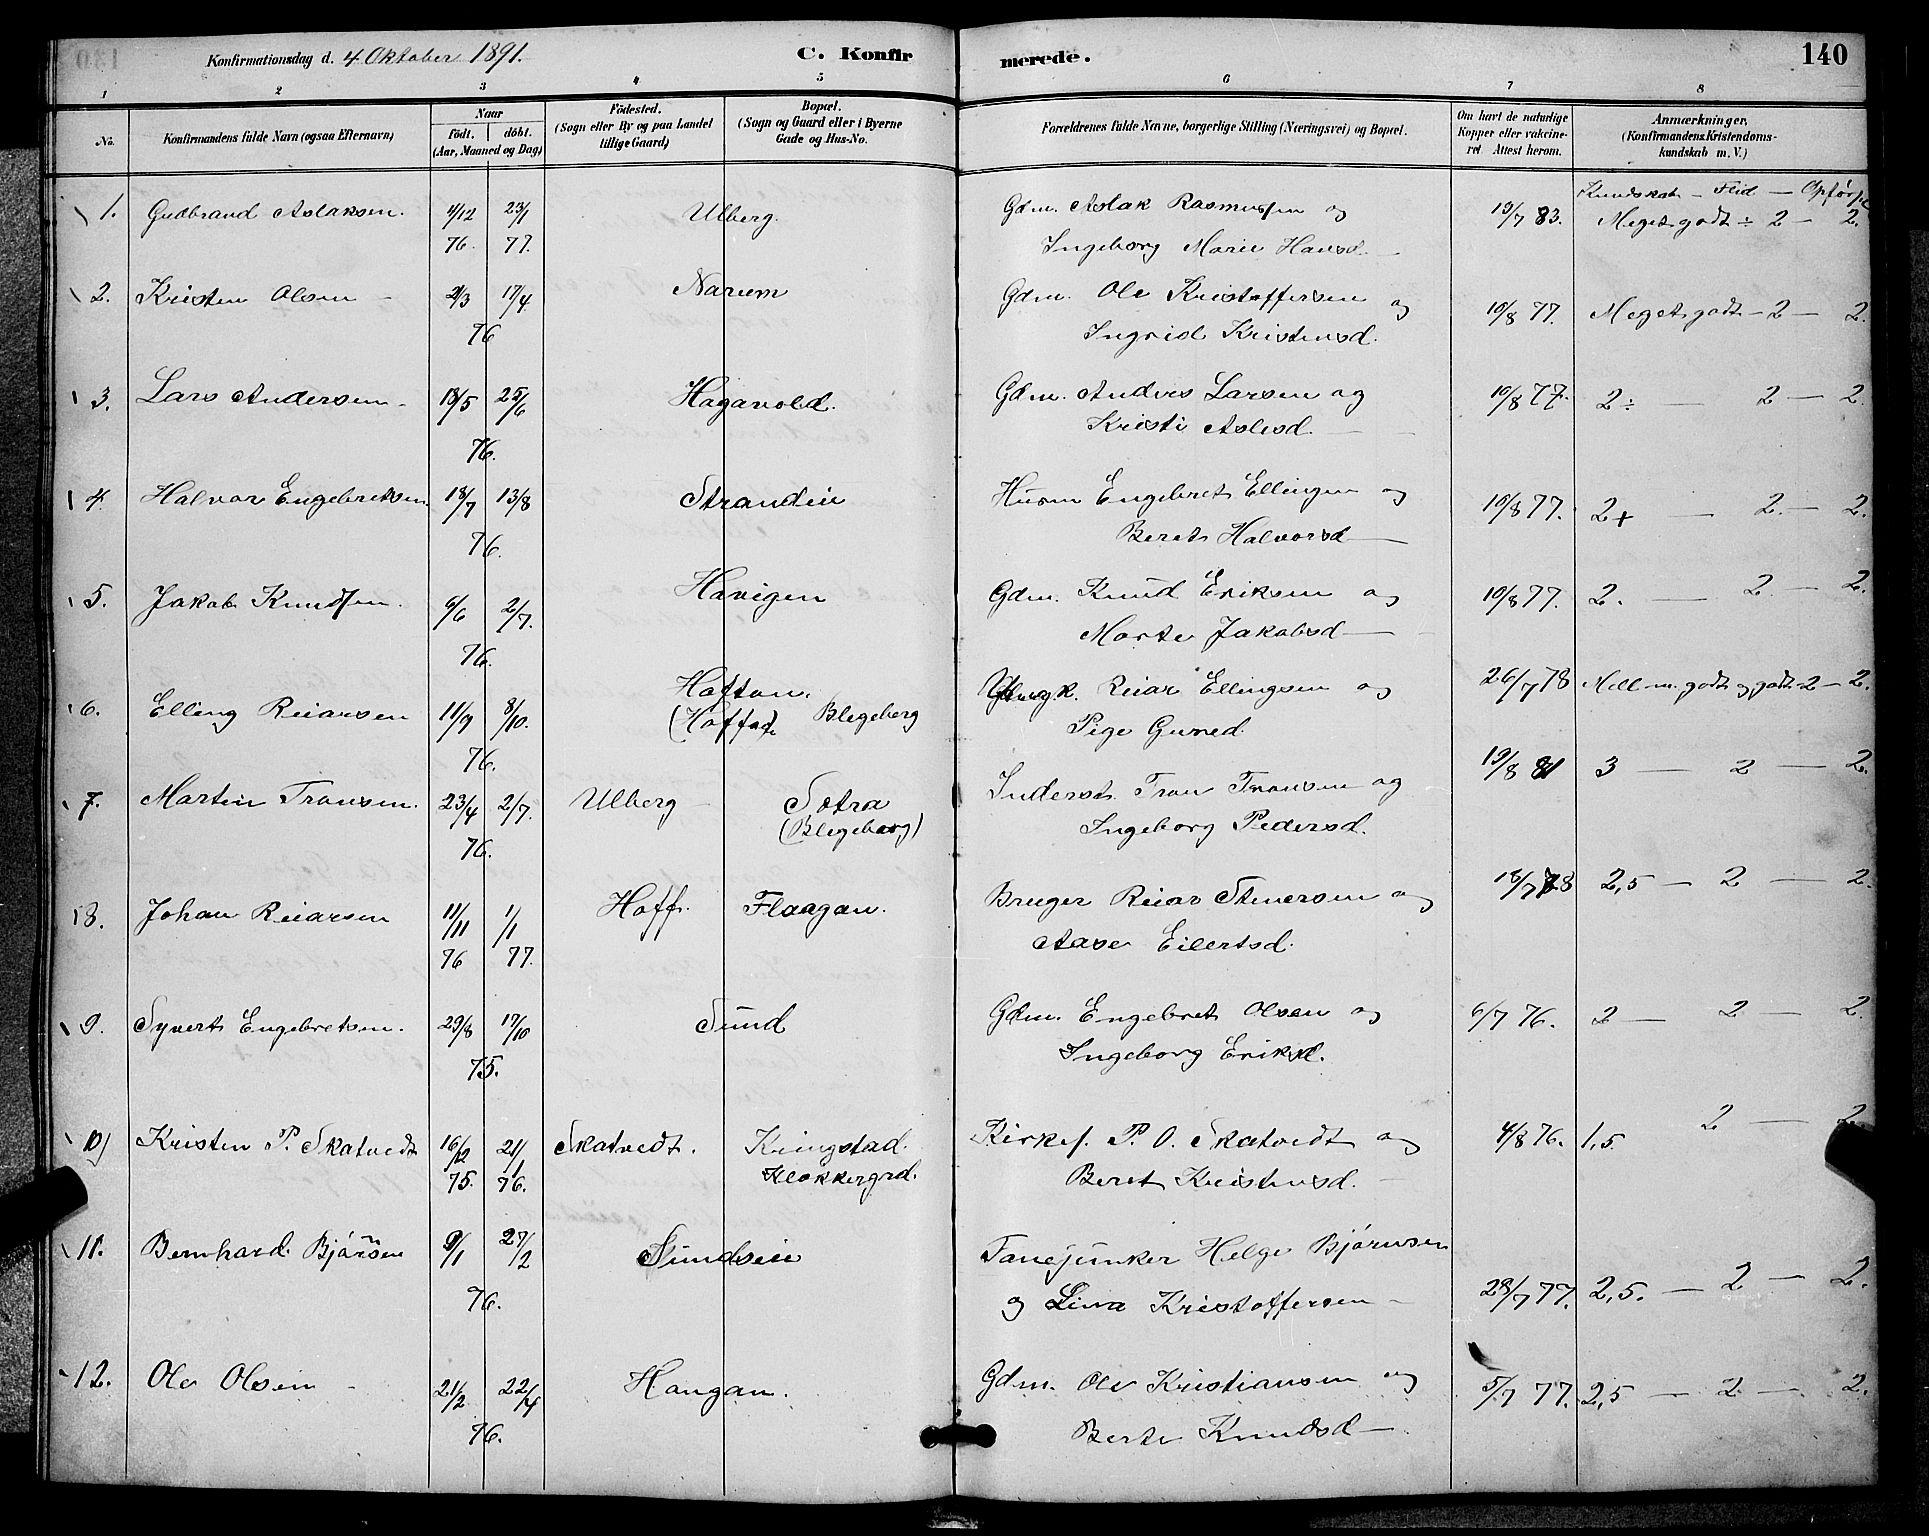 SAKO, Sigdal kirkebøker, G/Ga/L0005: Klokkerbok nr. I 5, 1886-1900, s. 140